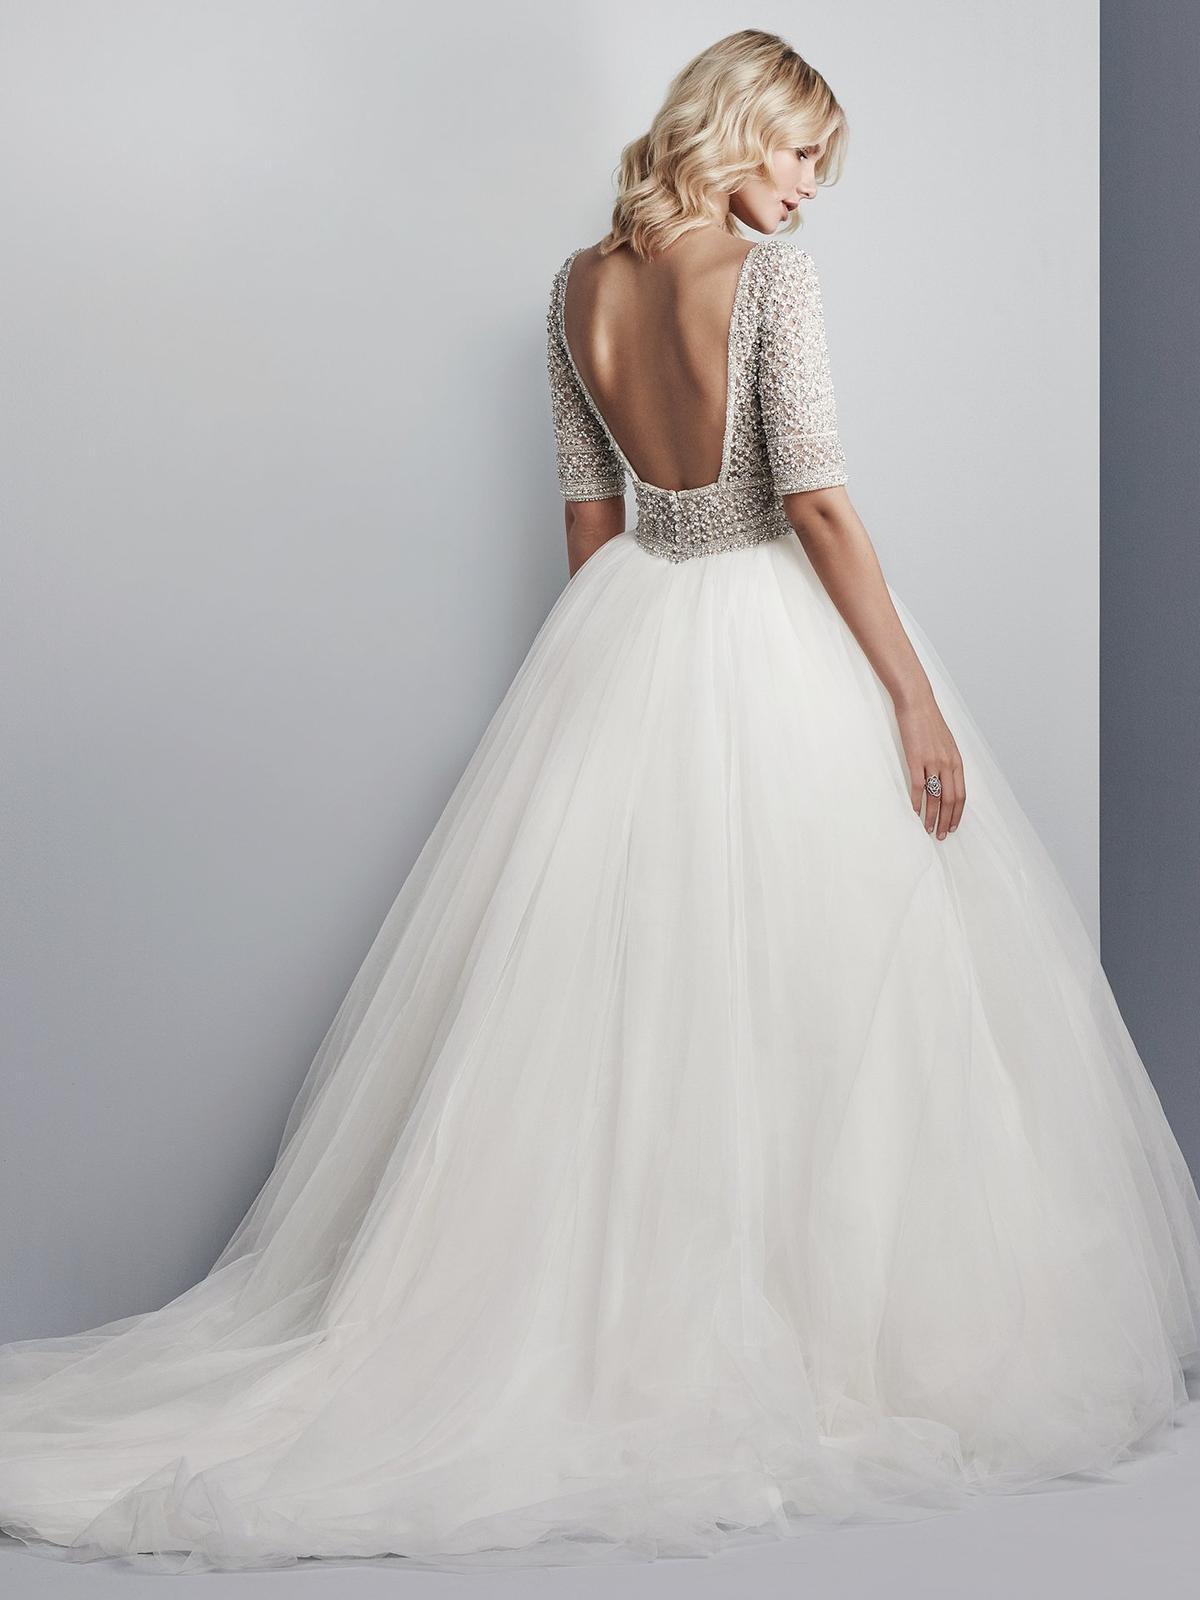 Svatební salon EL - Obrázek č. 3